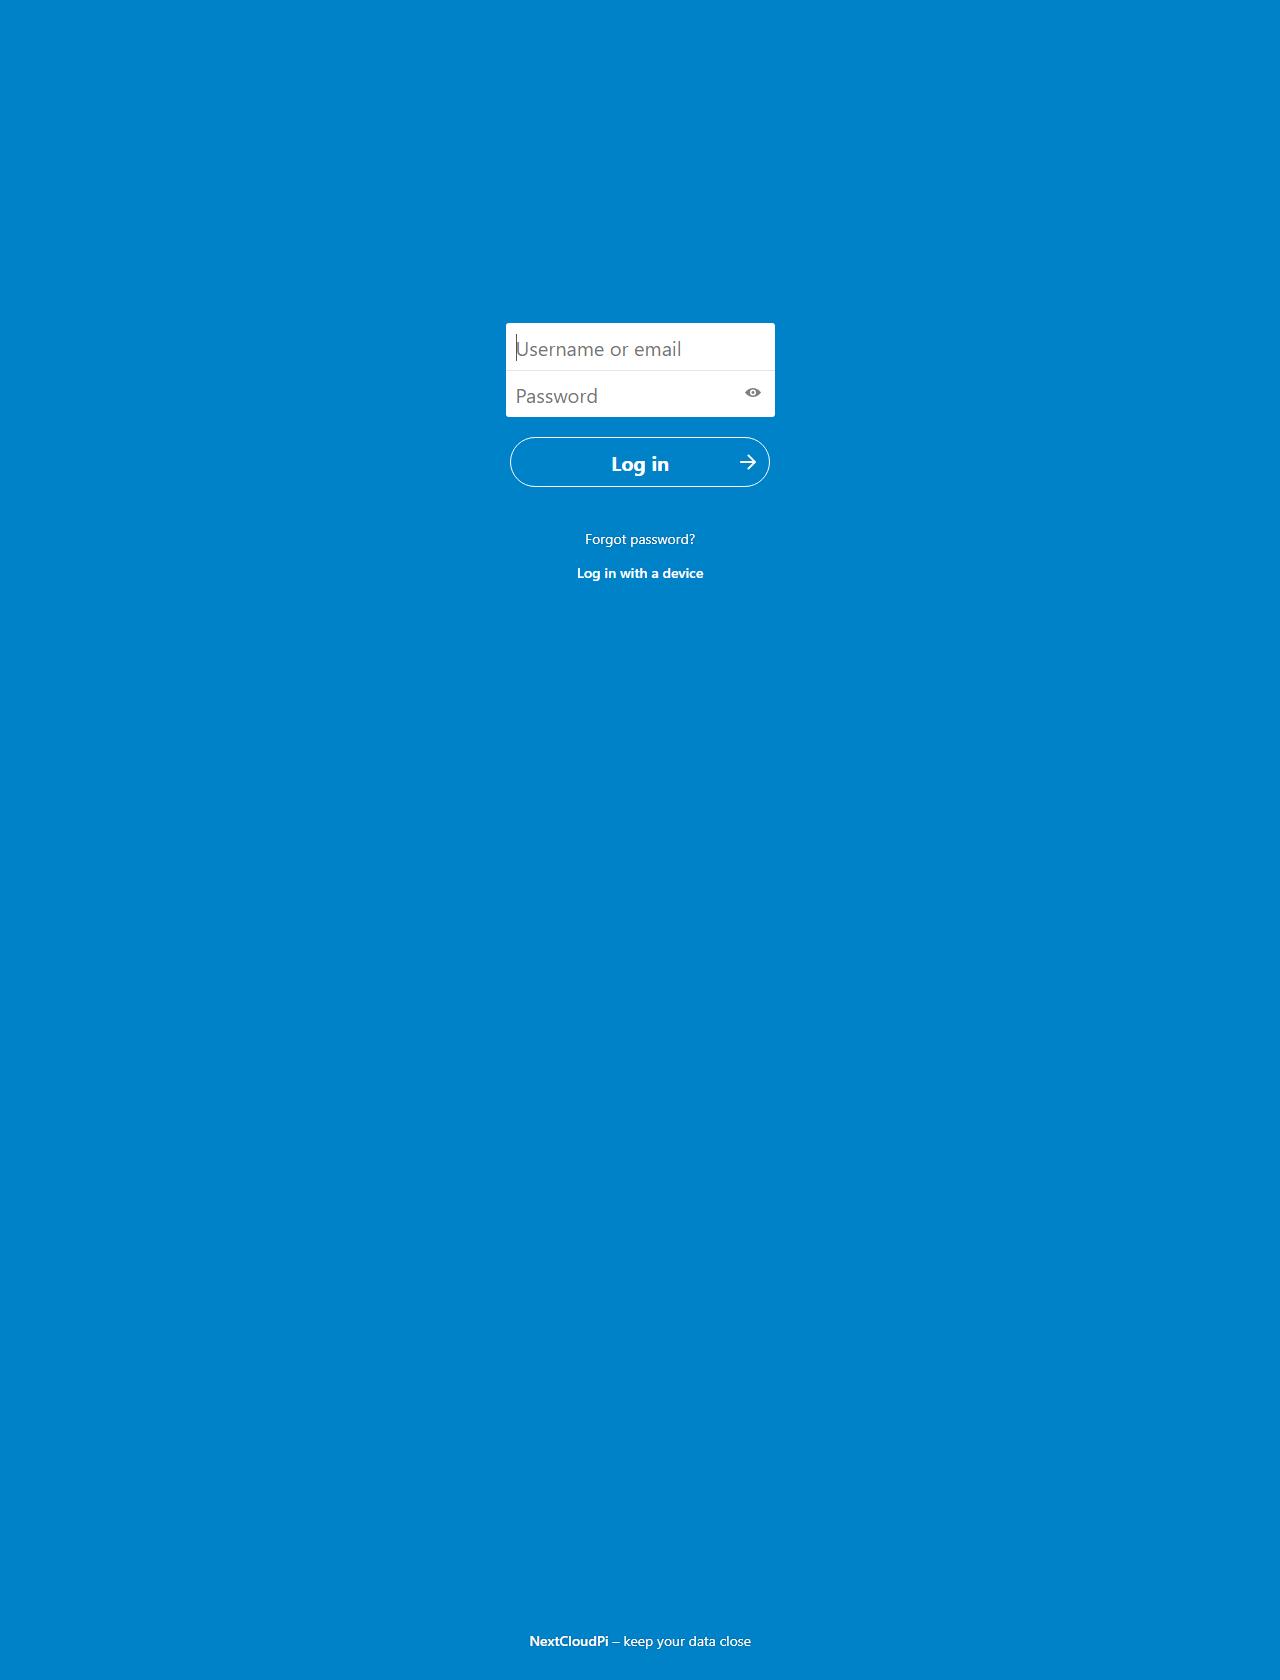 Screenshot Desktop - https://bananowachmura.ddns.net/index.php/login